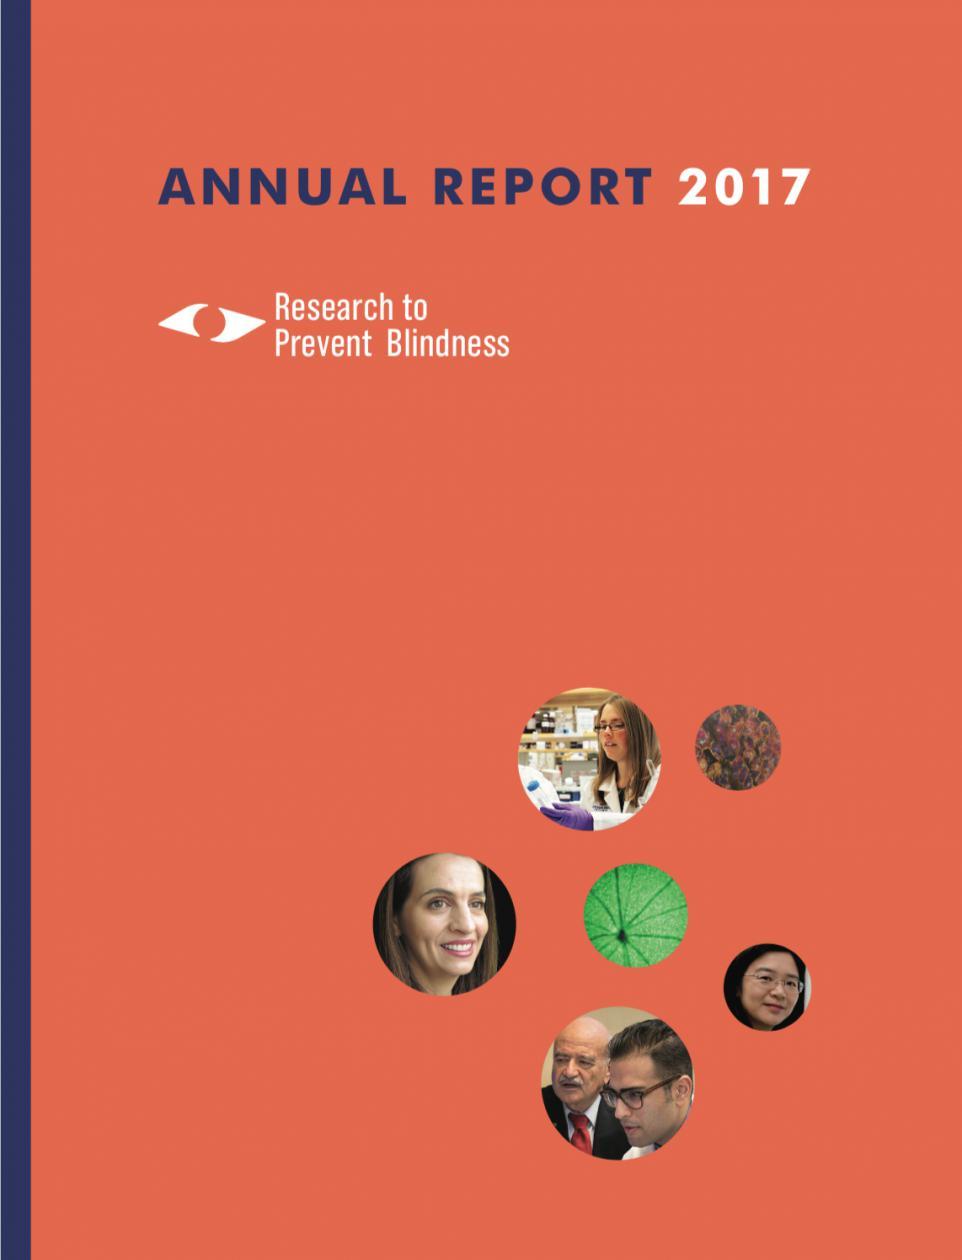 RPB 2017 Annual Report